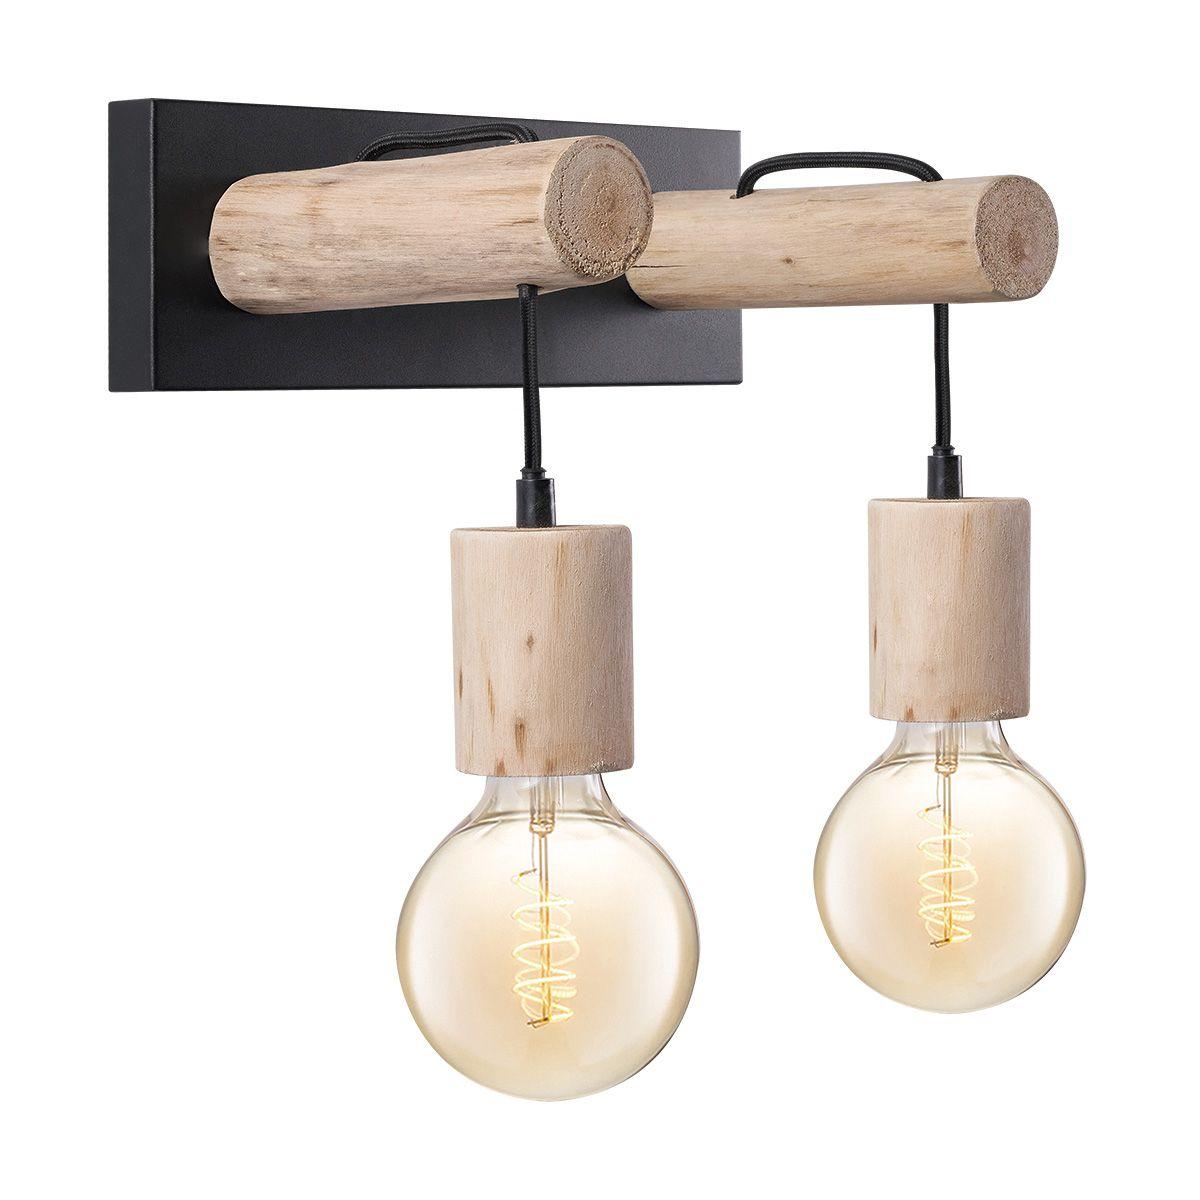 Home sweet home wandlamp Billy 2 lichts - hout - metaal